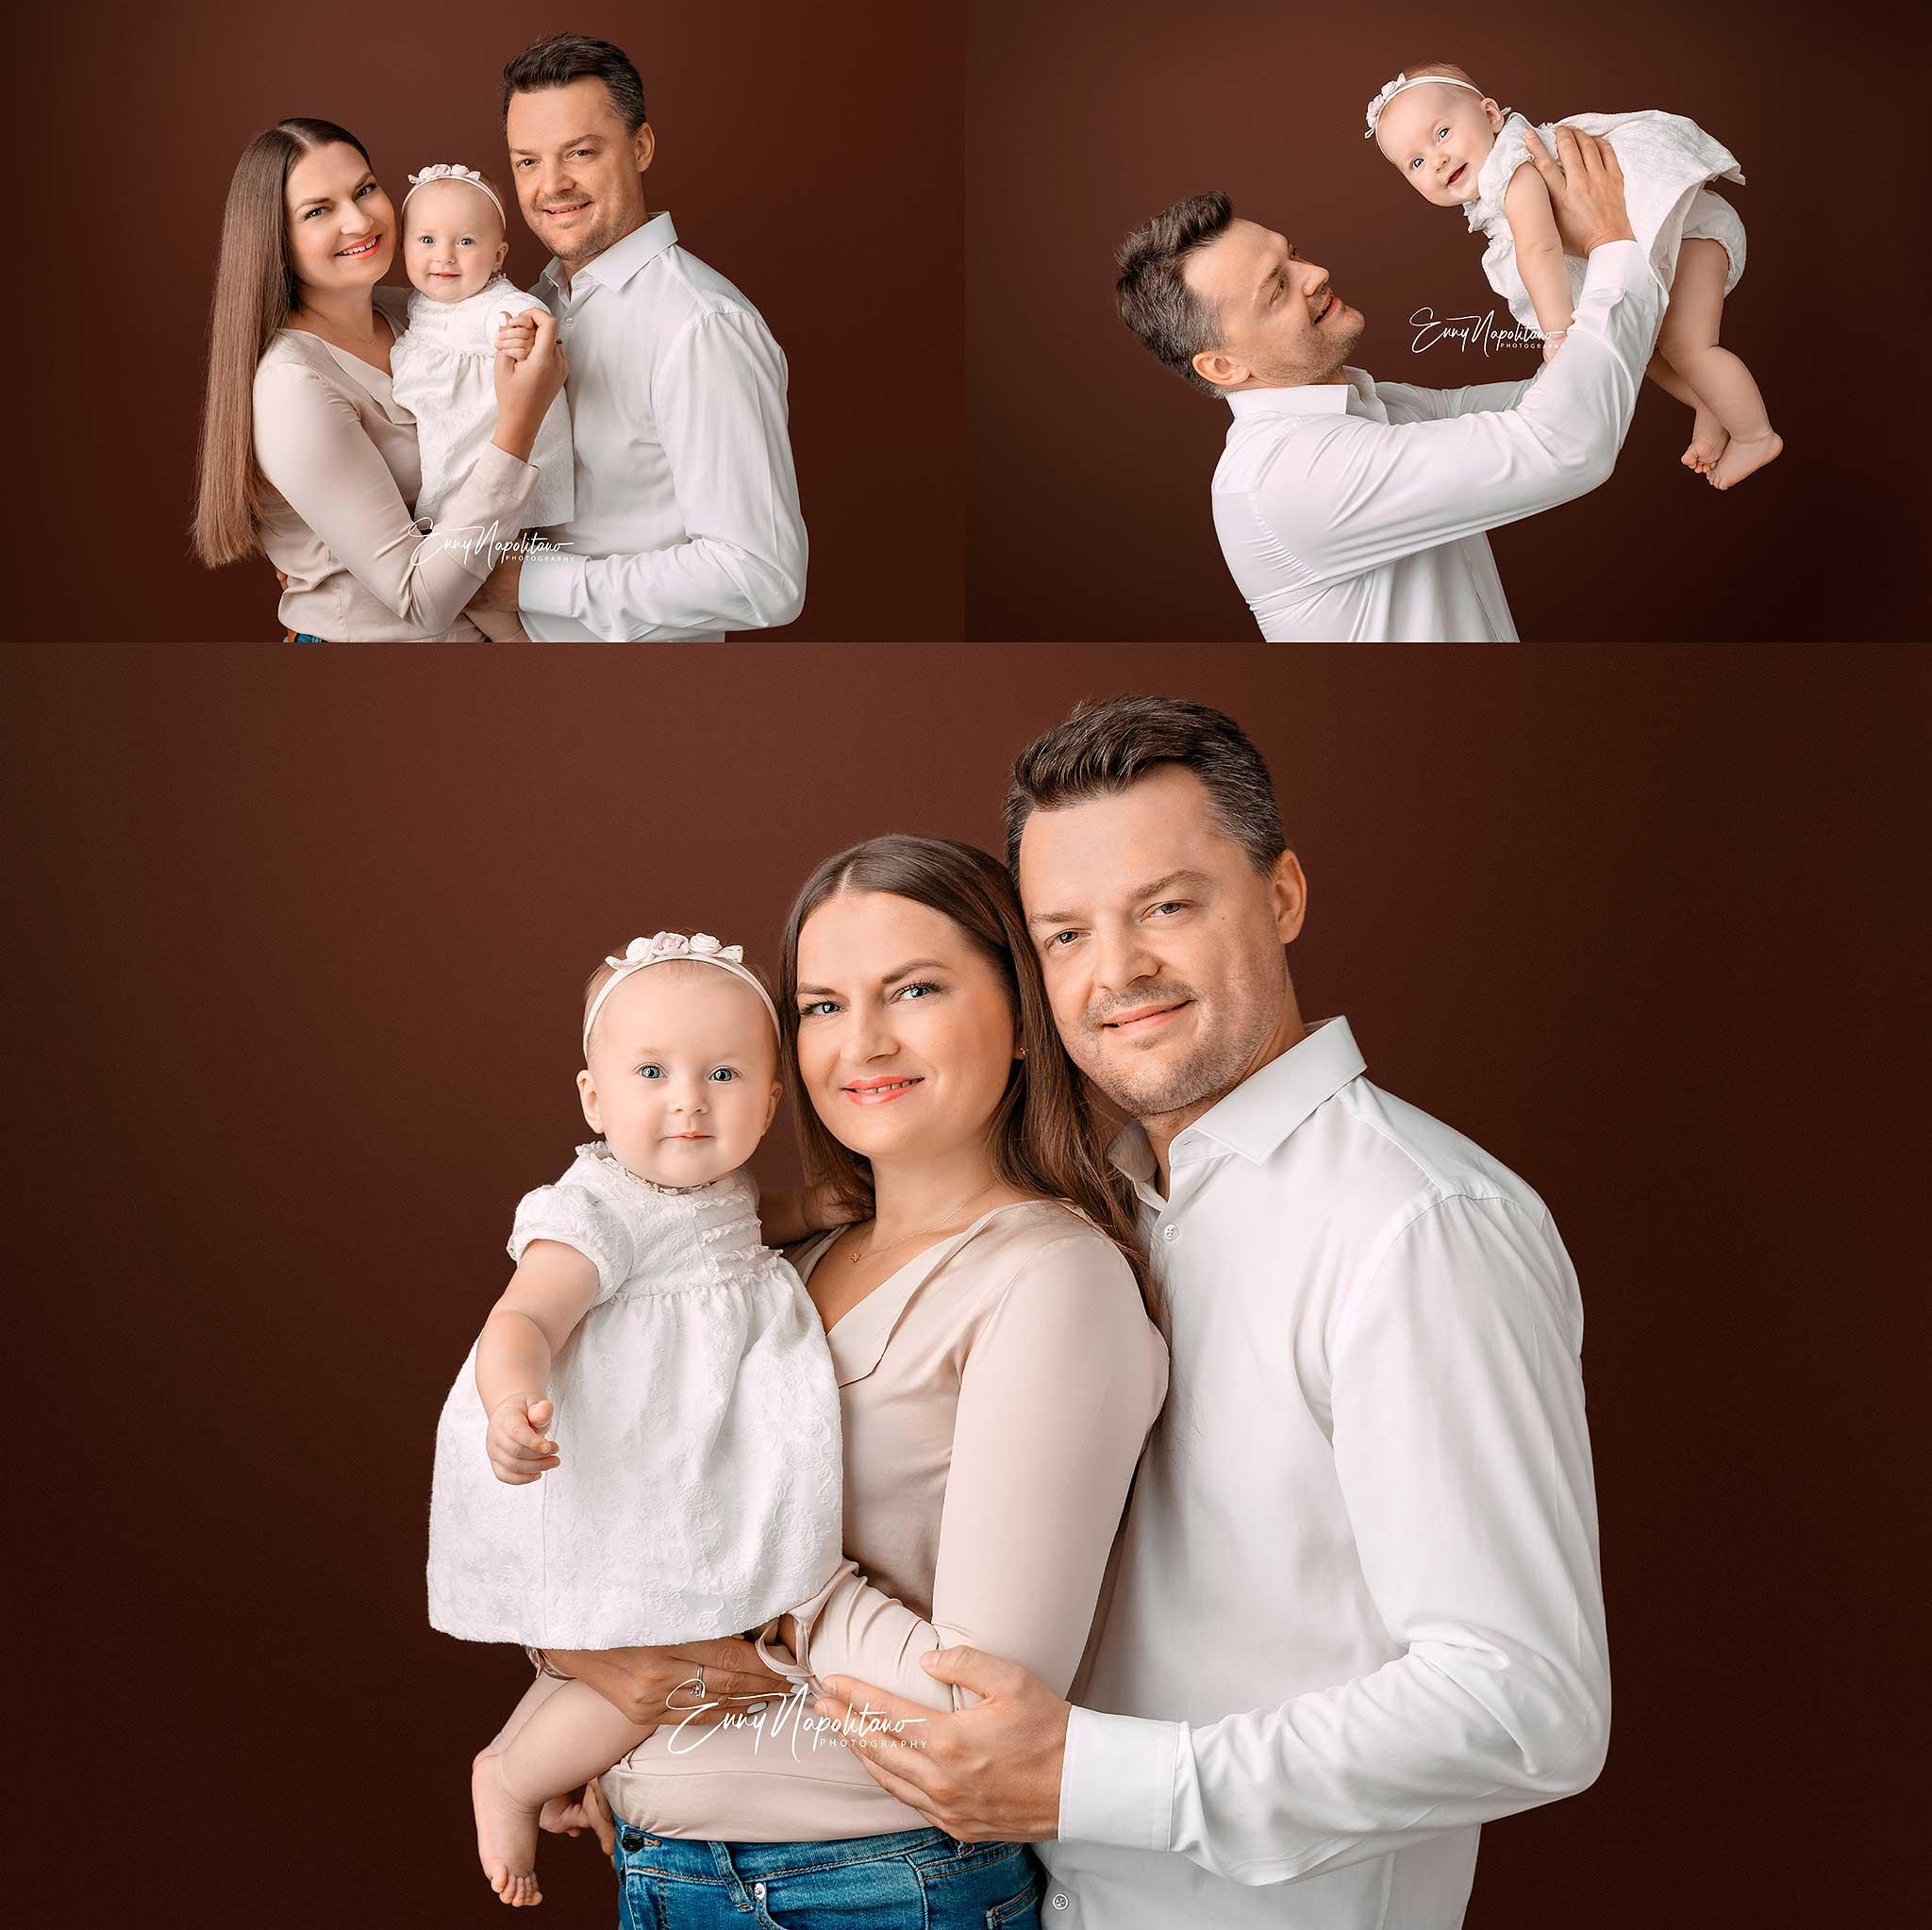 famiglia con bimba di 6 mesi